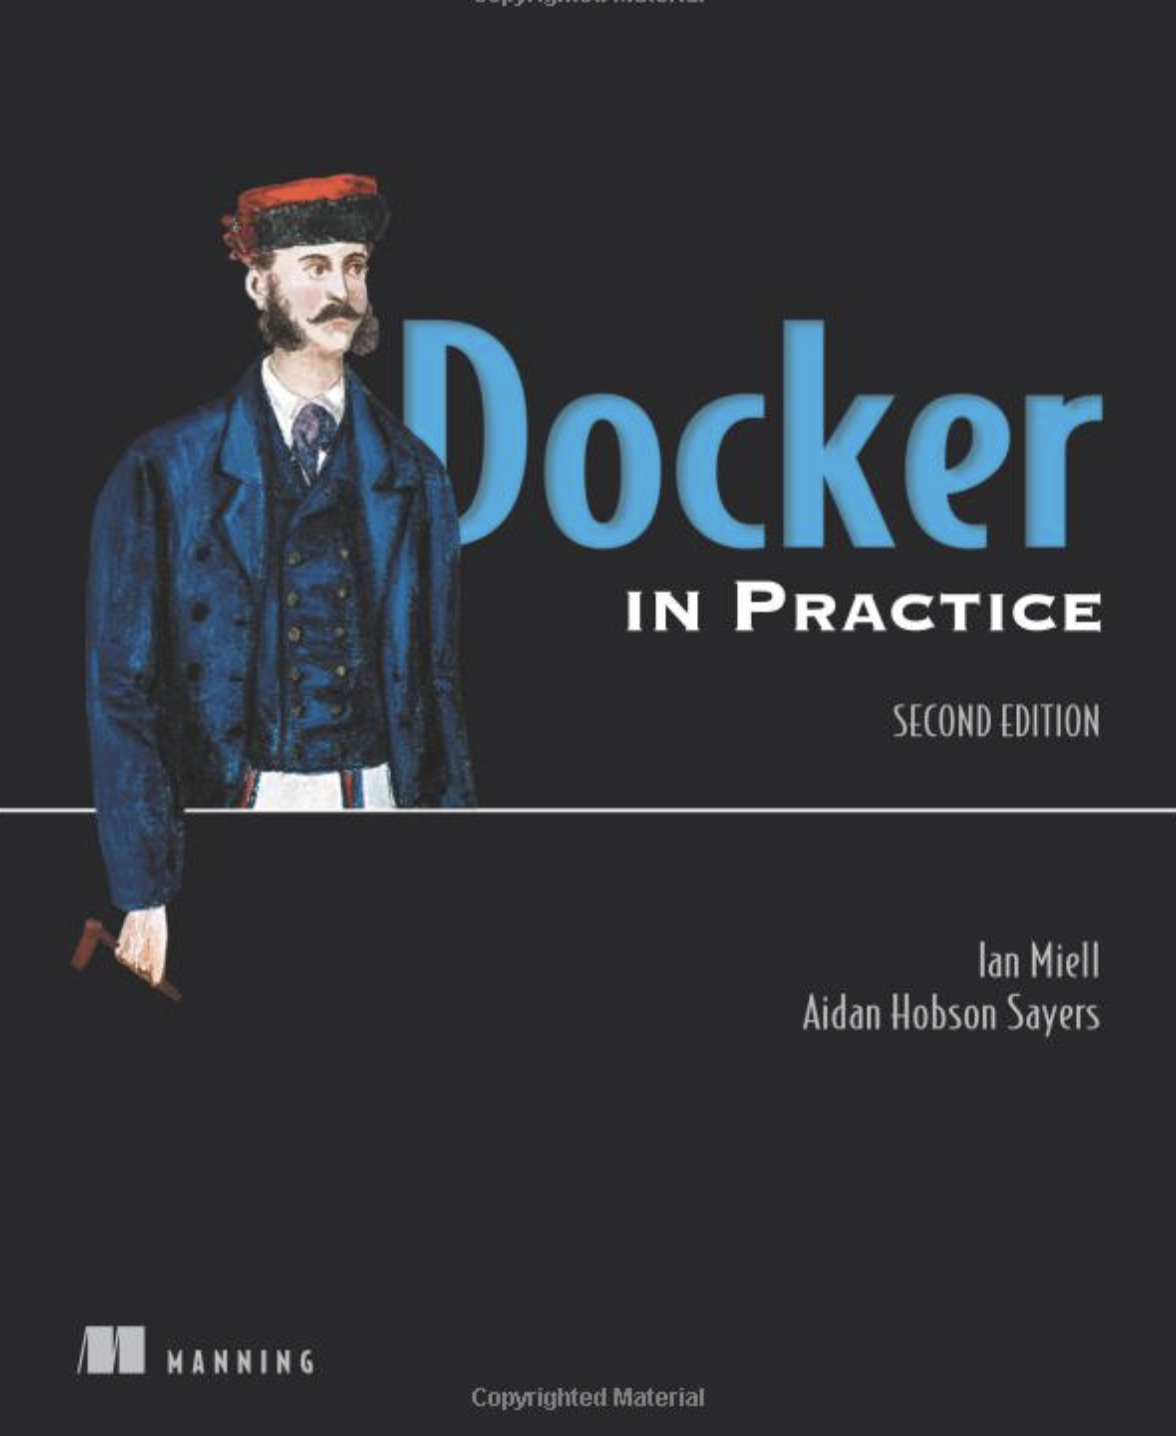 Docker in Practice Book Cover